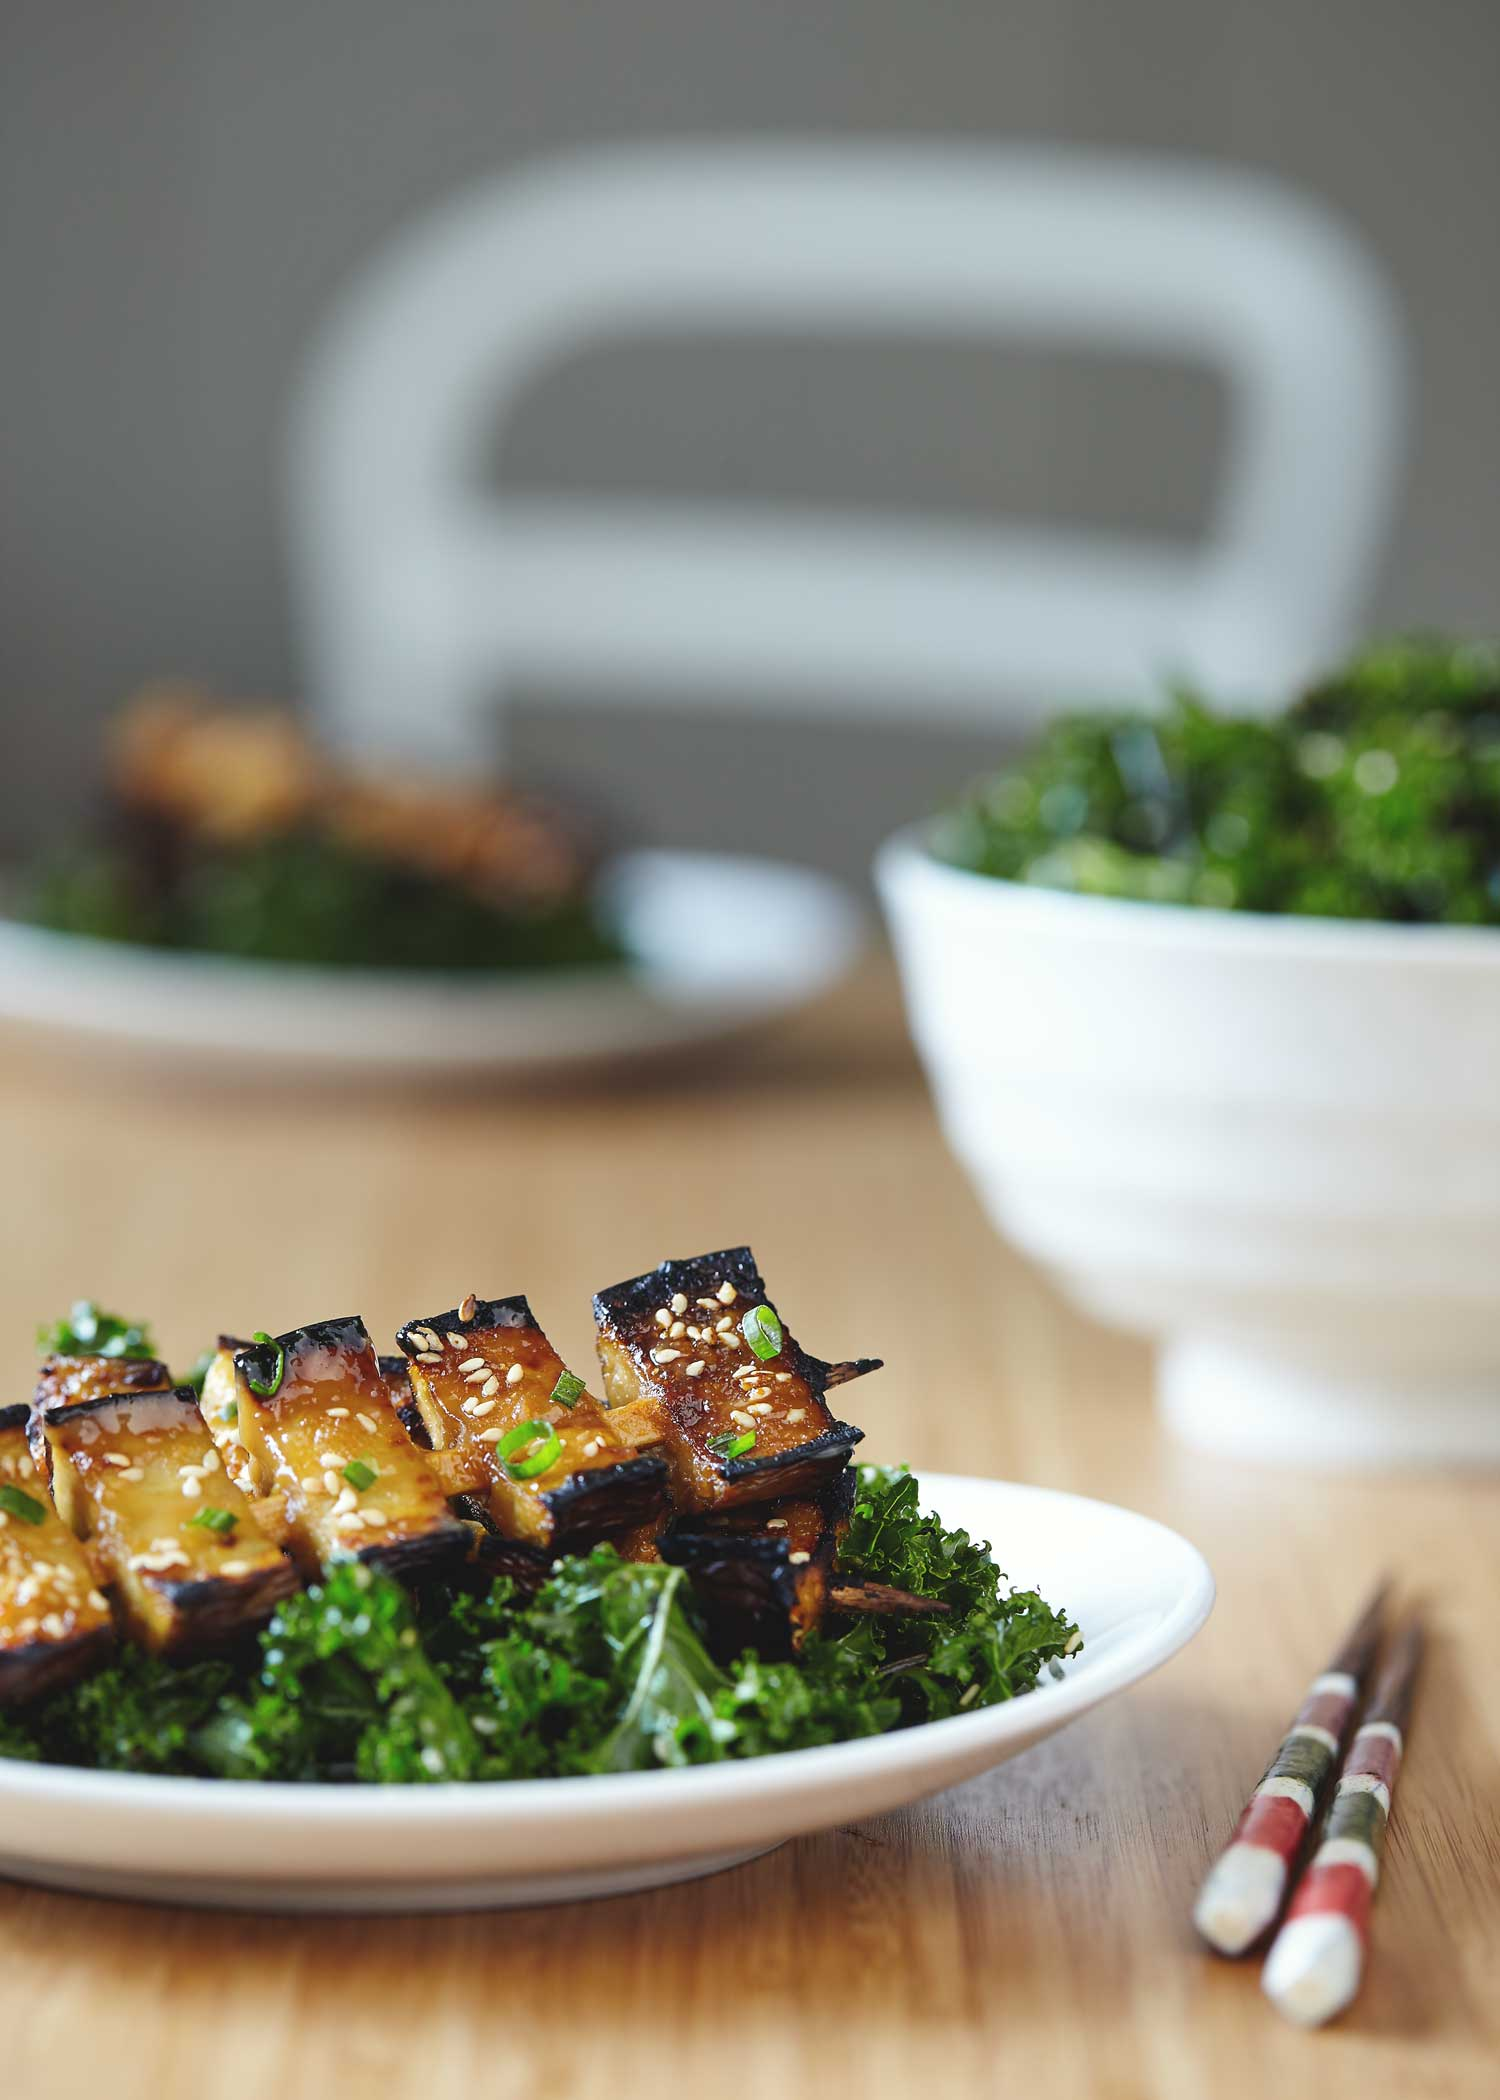 Miso-Glazed-Eggplant-Kebabs-with-Kale-Seaweed-Salad-Evergreen-Kitchen-1.jpg